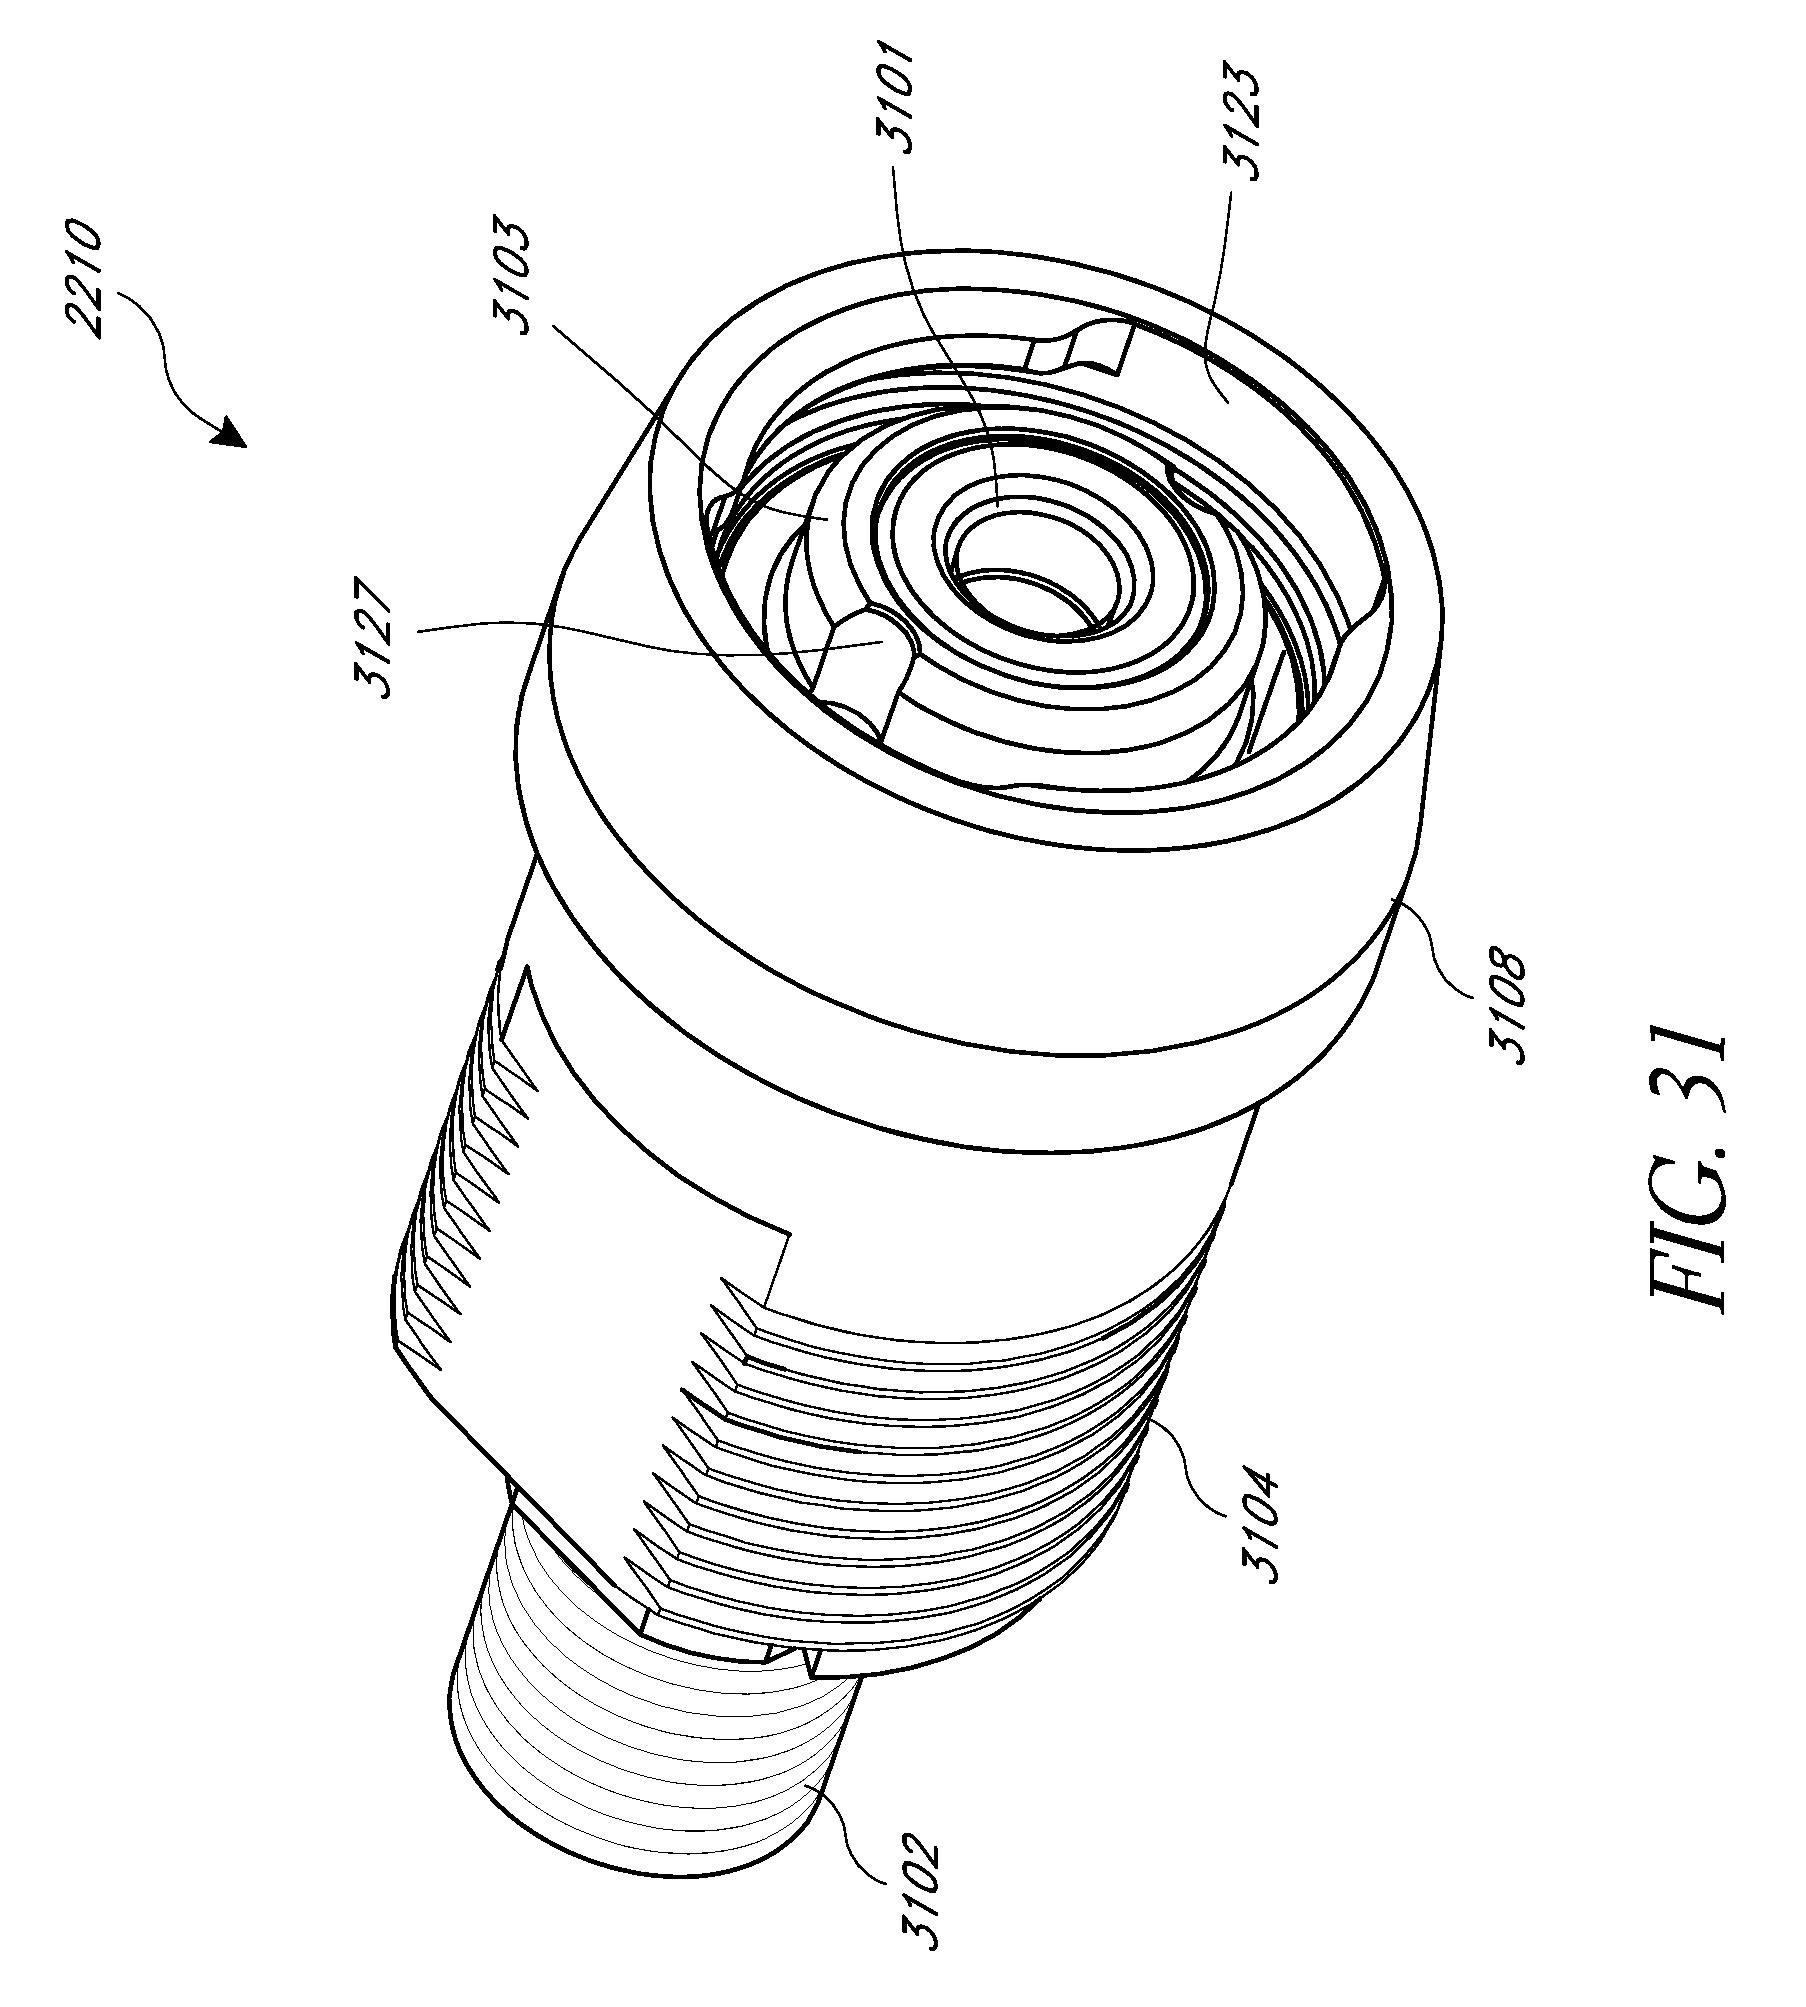 Patent US 9,041,510 B2